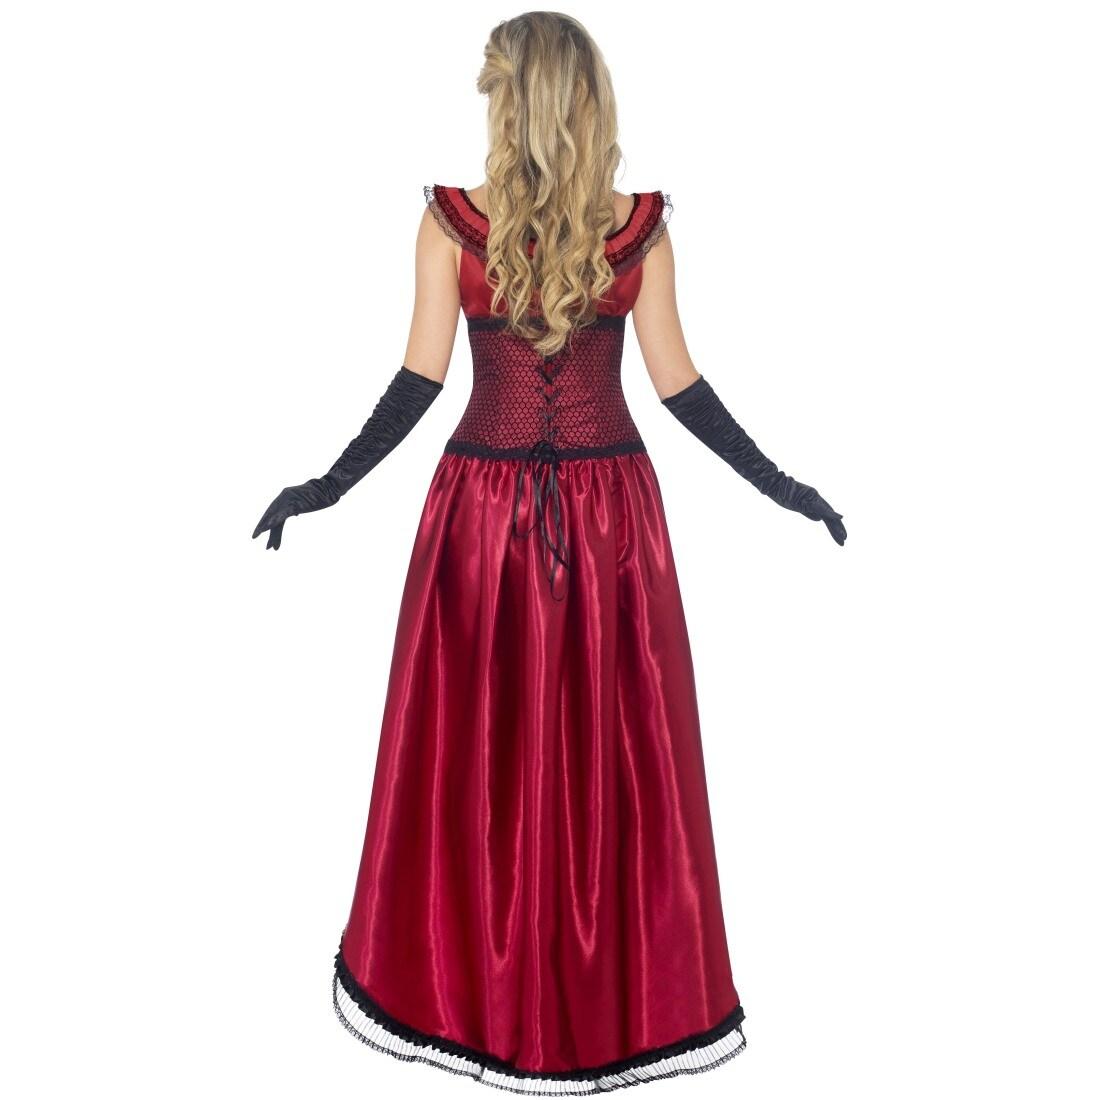 Saloonlady Cancan Kostüm Kleid Burleske Saloon Lady Saloongirl Burlesque